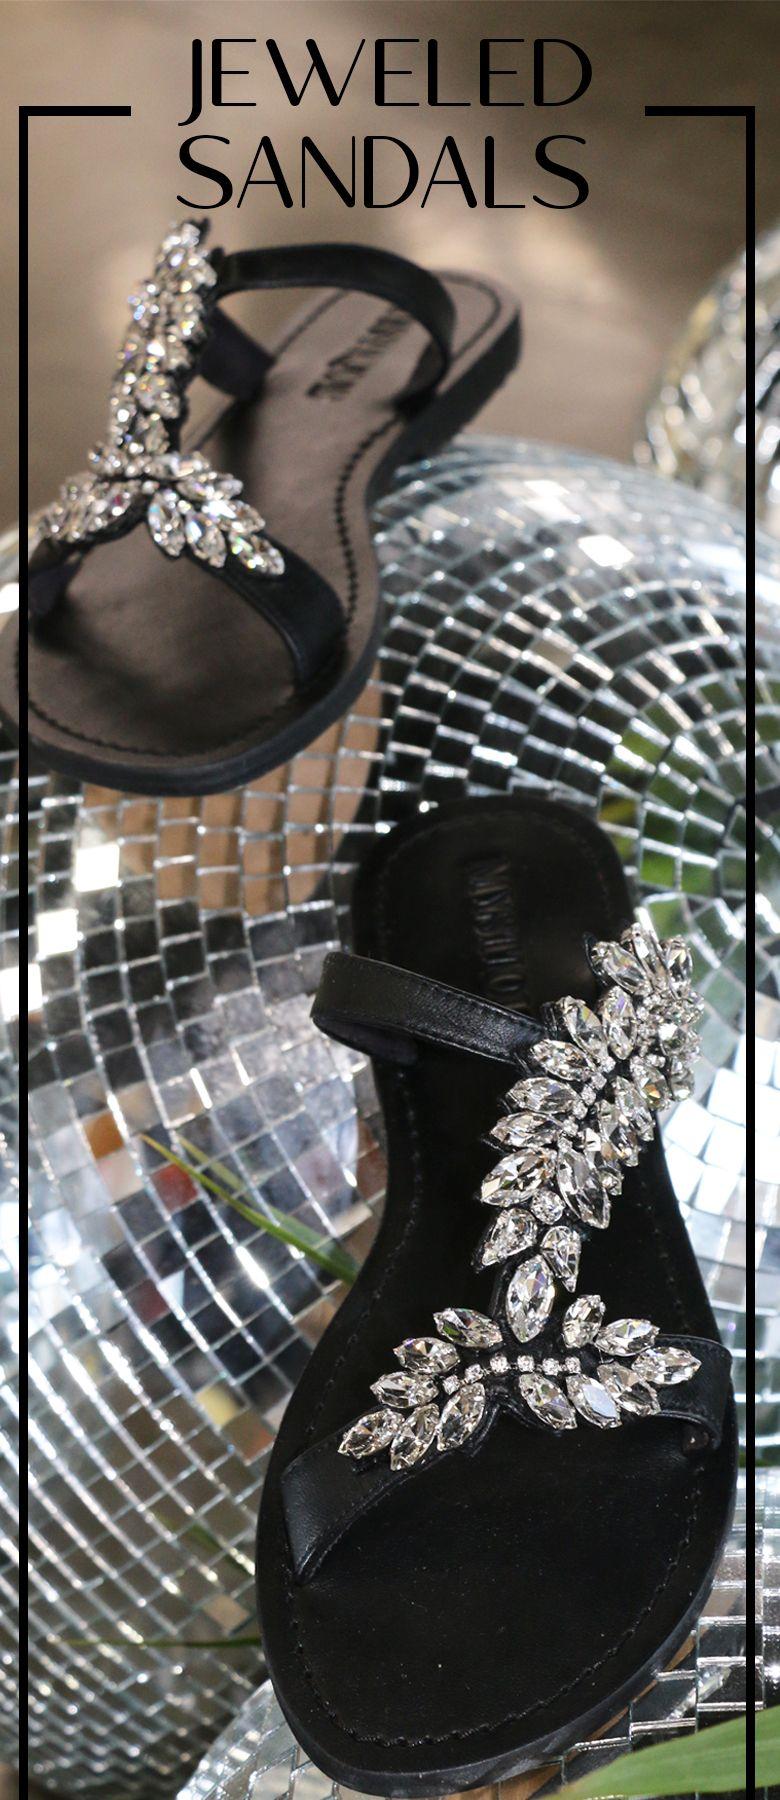 Black Leather Handmade Jeweled Sandals Fashion Giftideas Love Jeweled Sandals Leather Sandals Women Black Wedding Sandals [ 1800 x 780 Pixel ]